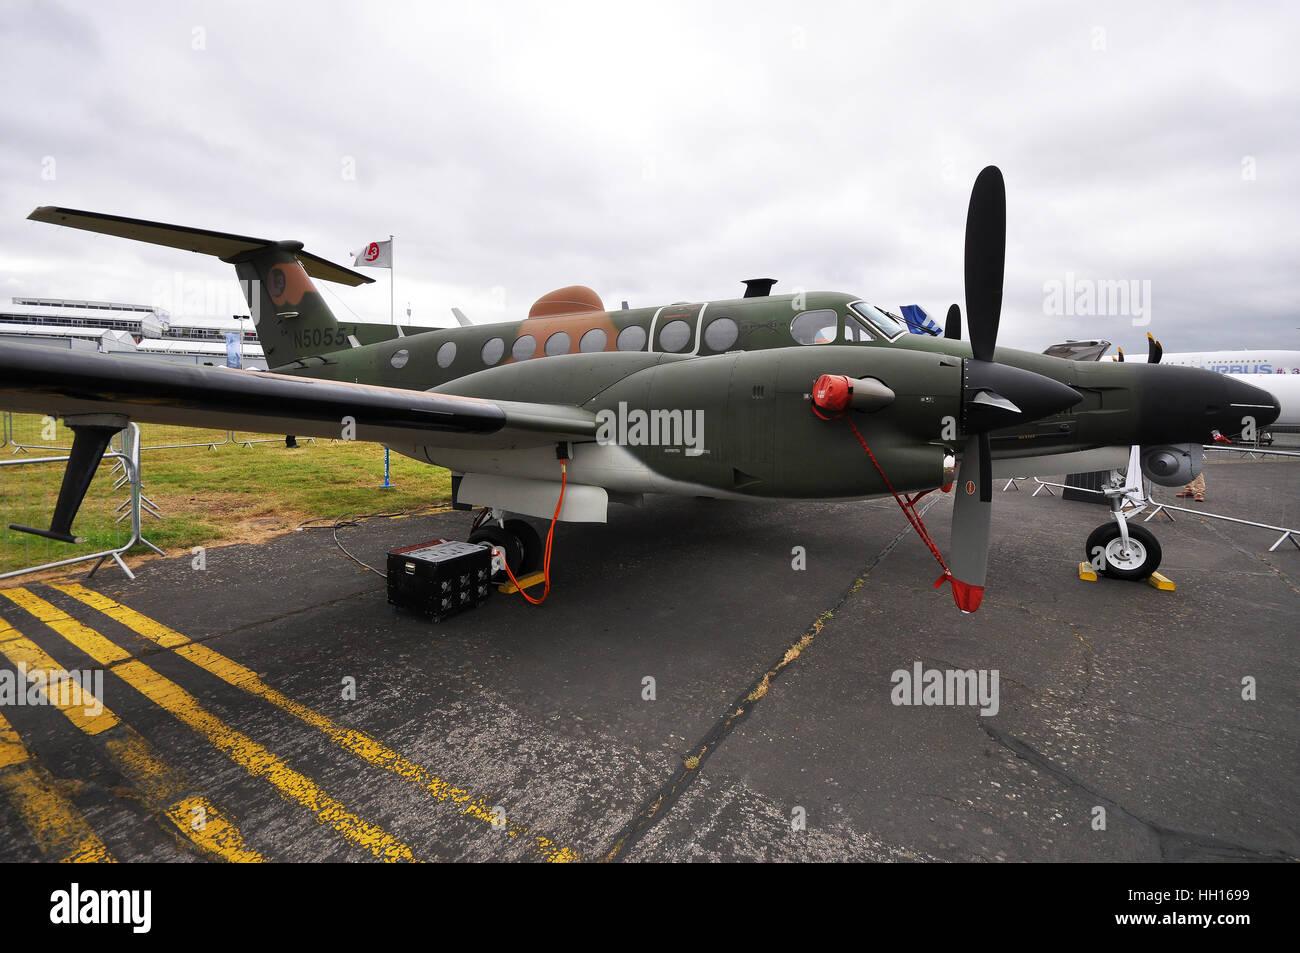 L3 Communications 'Spyder' surveillance platform using a Beechcraft King Air twin engined aircraft - Stock Image